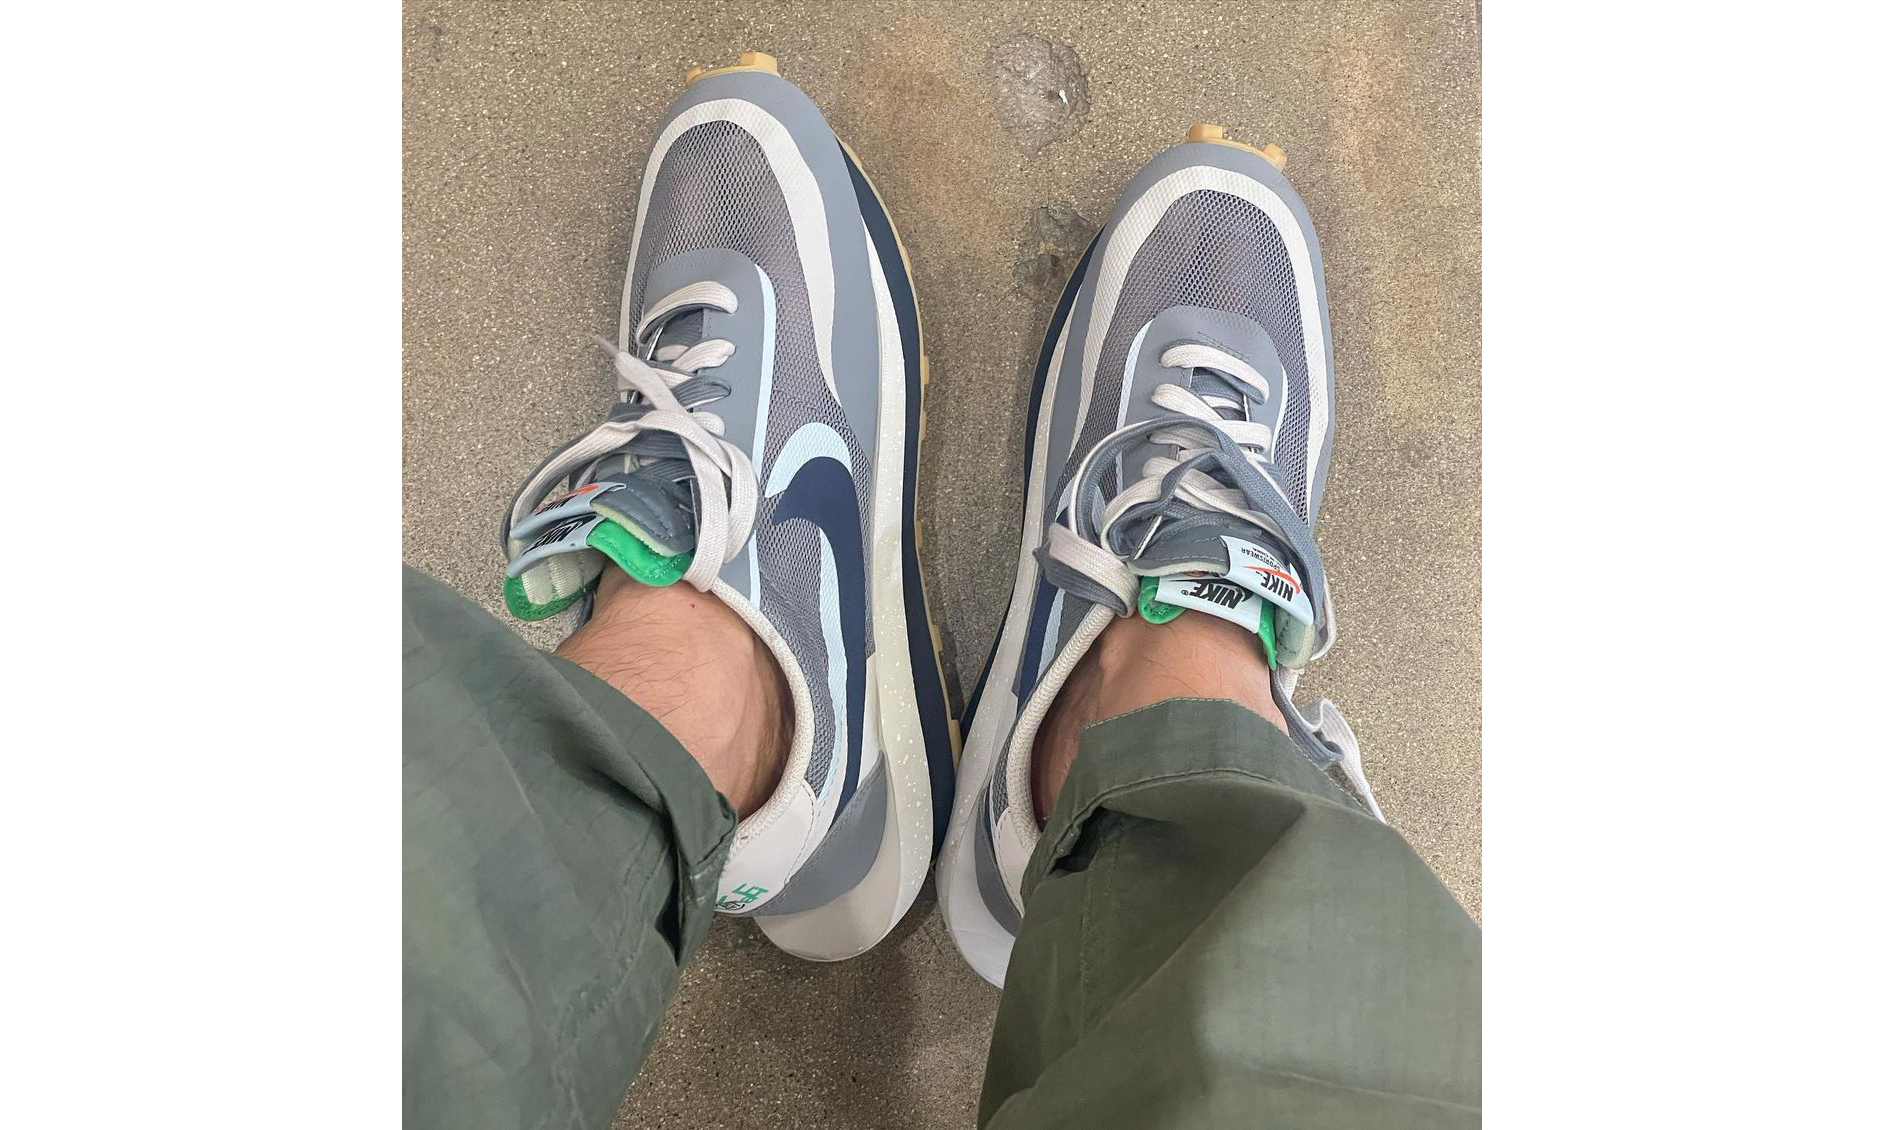 CLOT x sacai x Nike LDWaffle 第二款配色将于 10 月 7 日发售